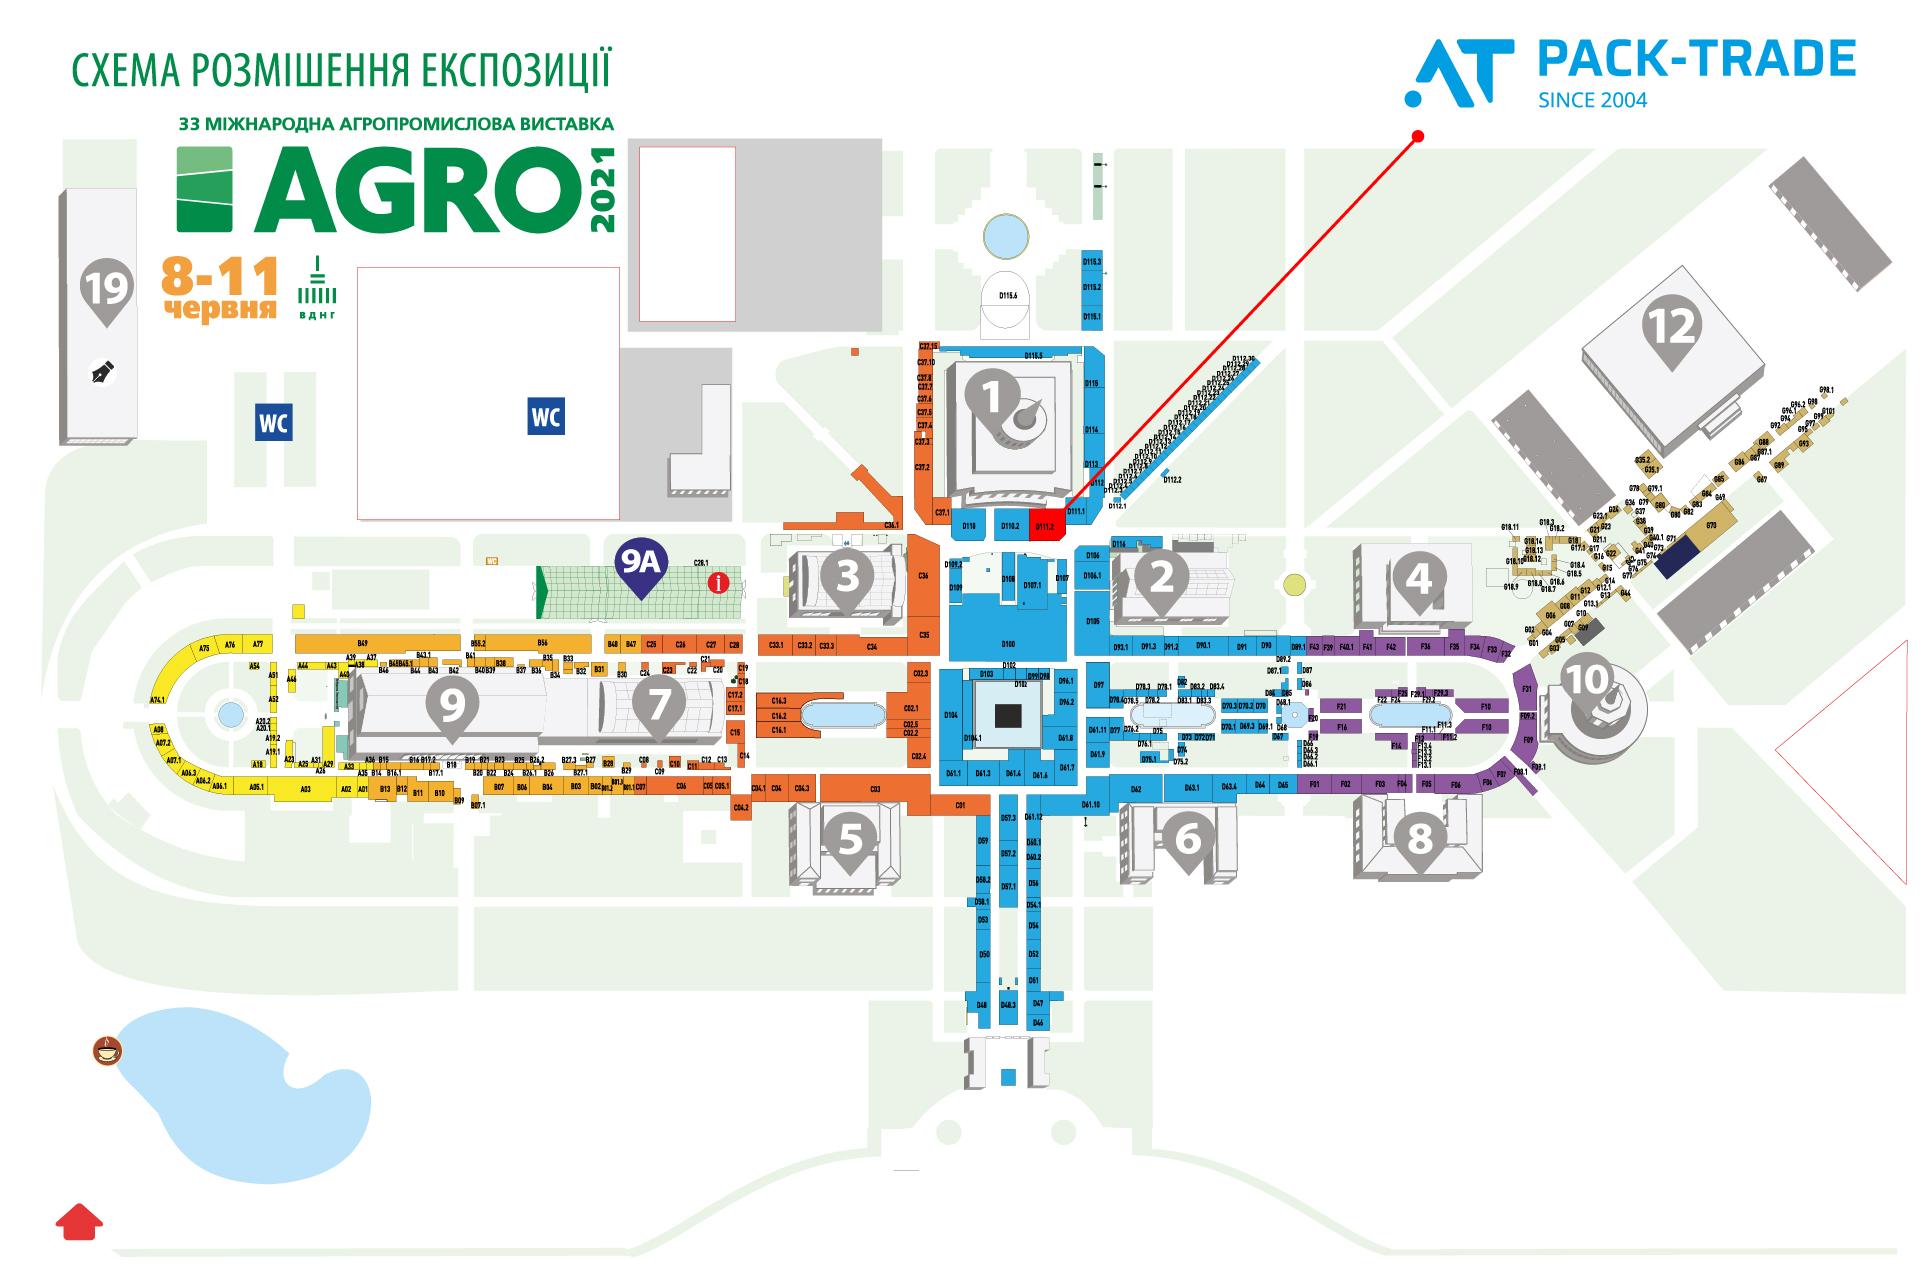 Пак-Трейд на Агро 2021 карта